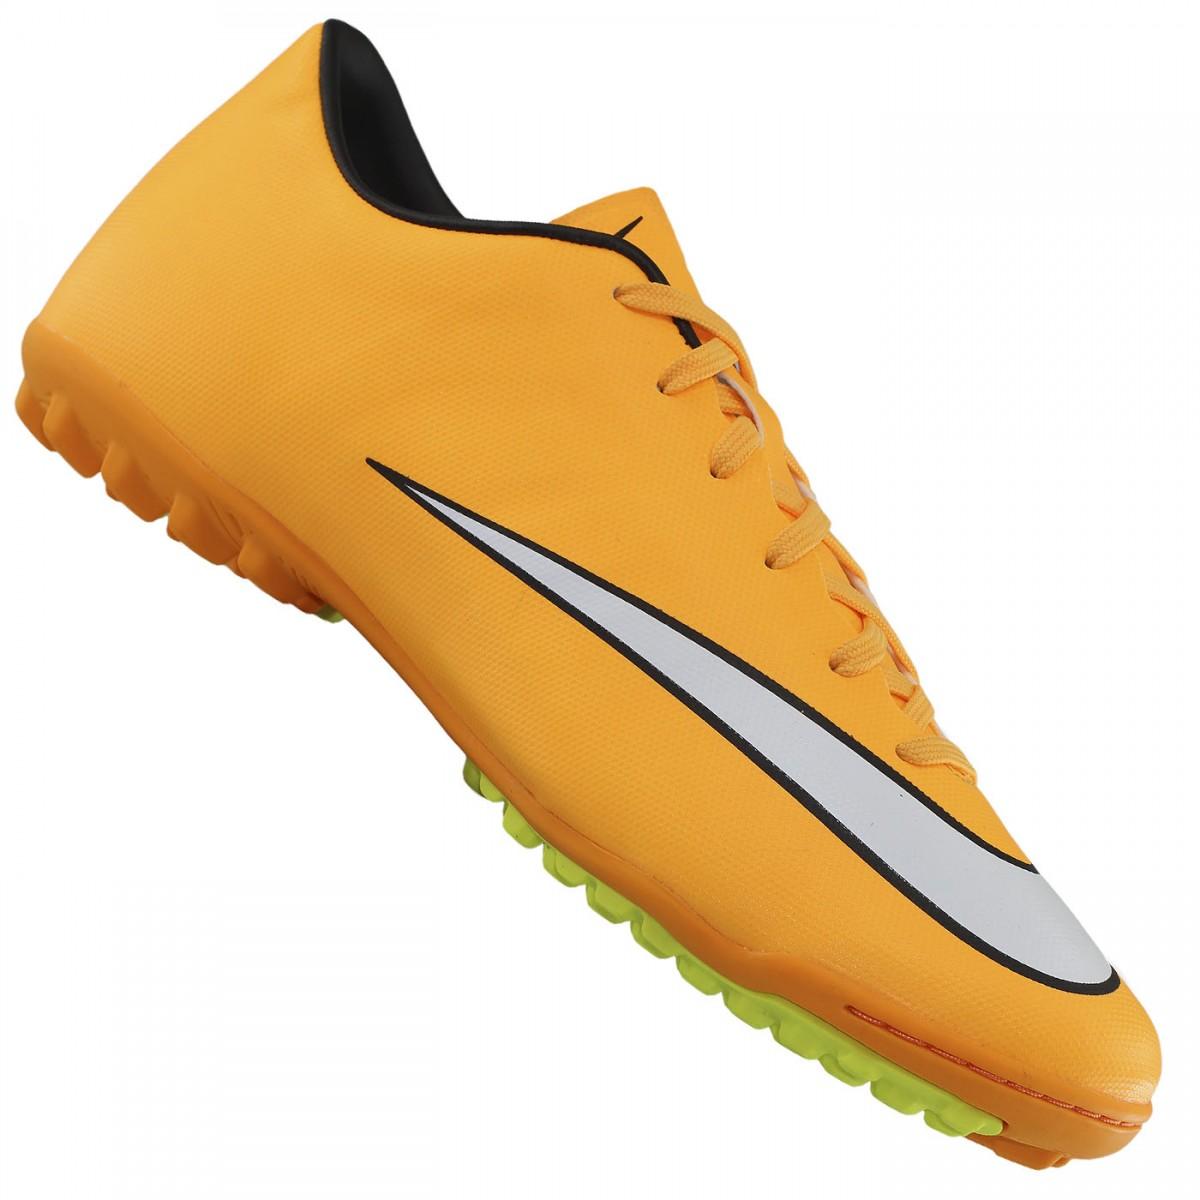 0e857fea21 Chuteira Nike Mercurial Victory V TF - Masculino